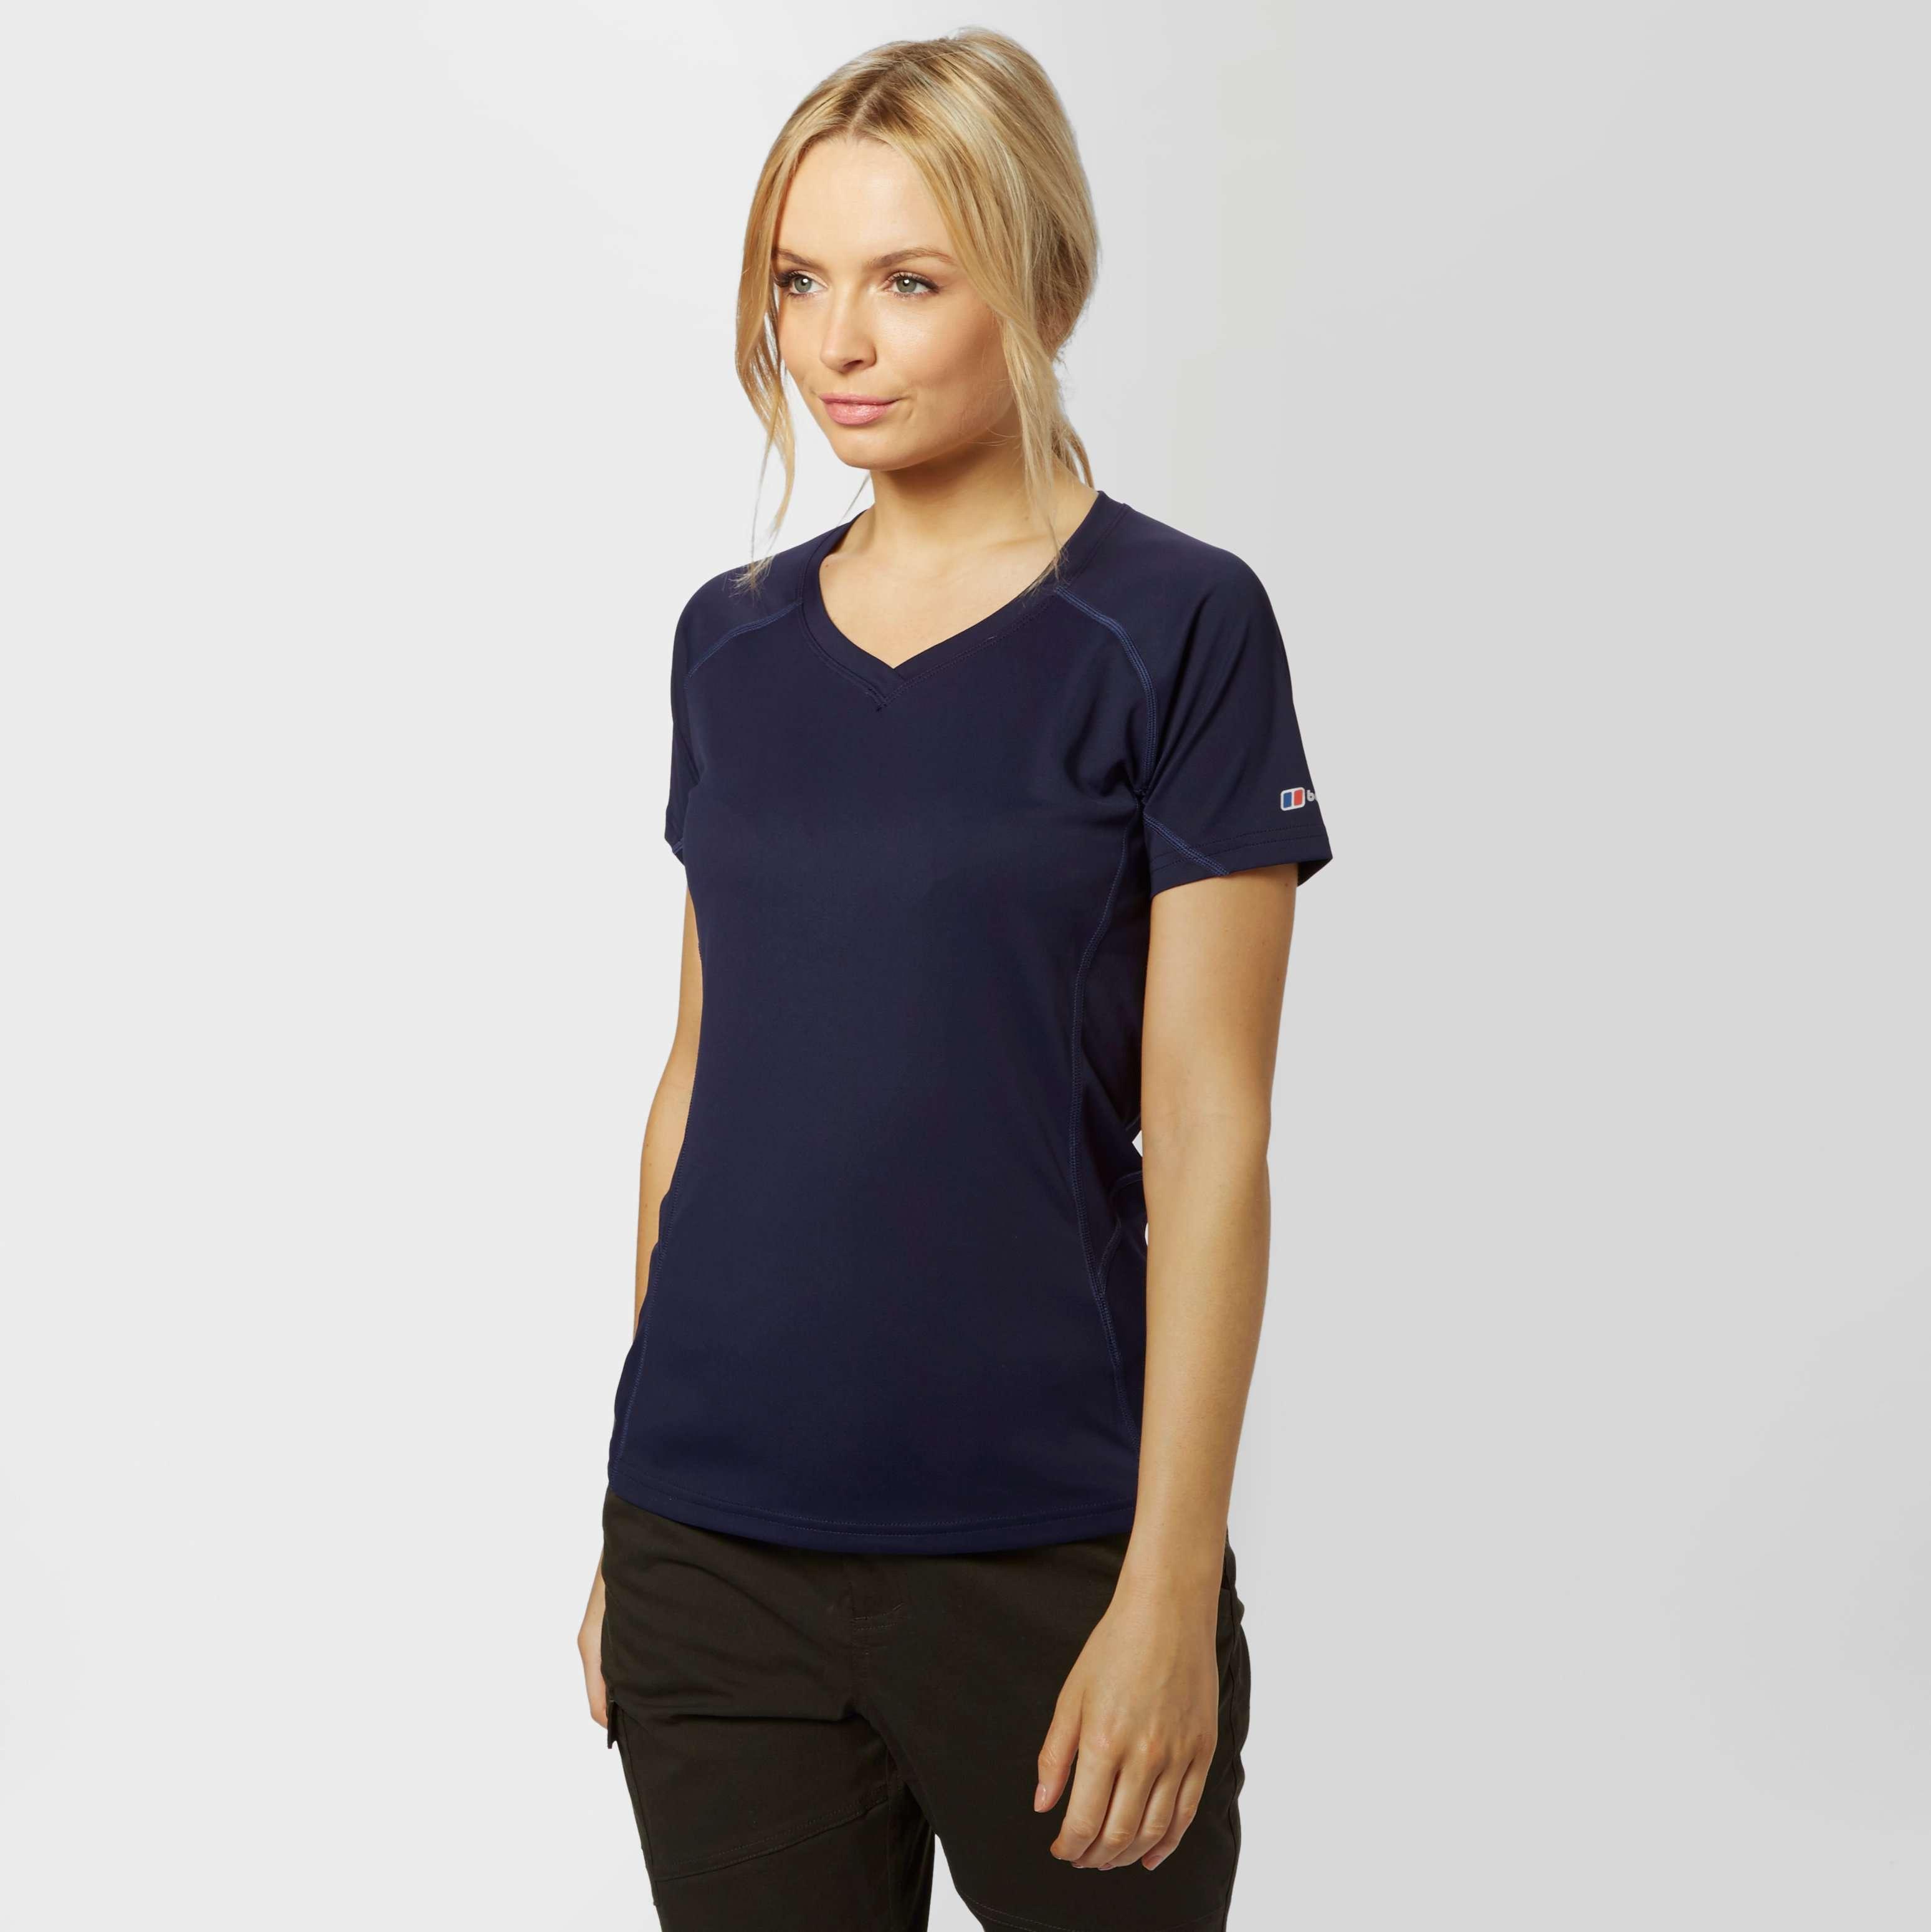 BERGHAUS Women's Short Sleeve V-Neck Tech Tee